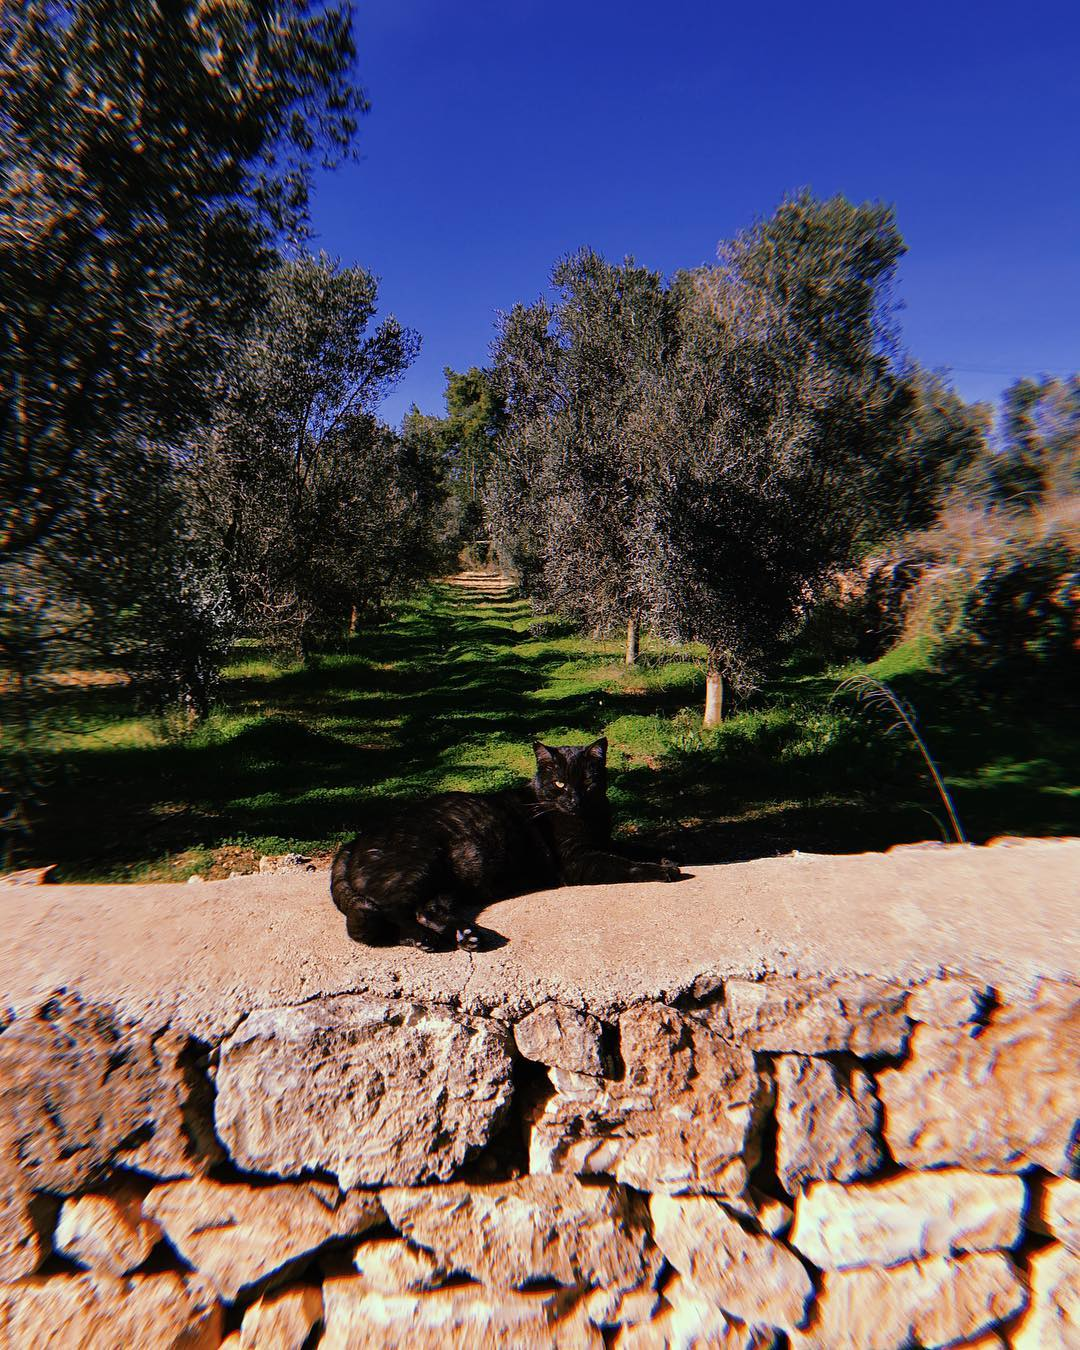 || Bathing in the December sun || #ninothehousecat #blackcat #mascota #sunbathing #goodlife #december #olivegrove #olivetrees #bluesky #mediterranean #garden #lascicadasibiza #finca #rustic #farmhouse #campo #nature #ibiza #winterseason